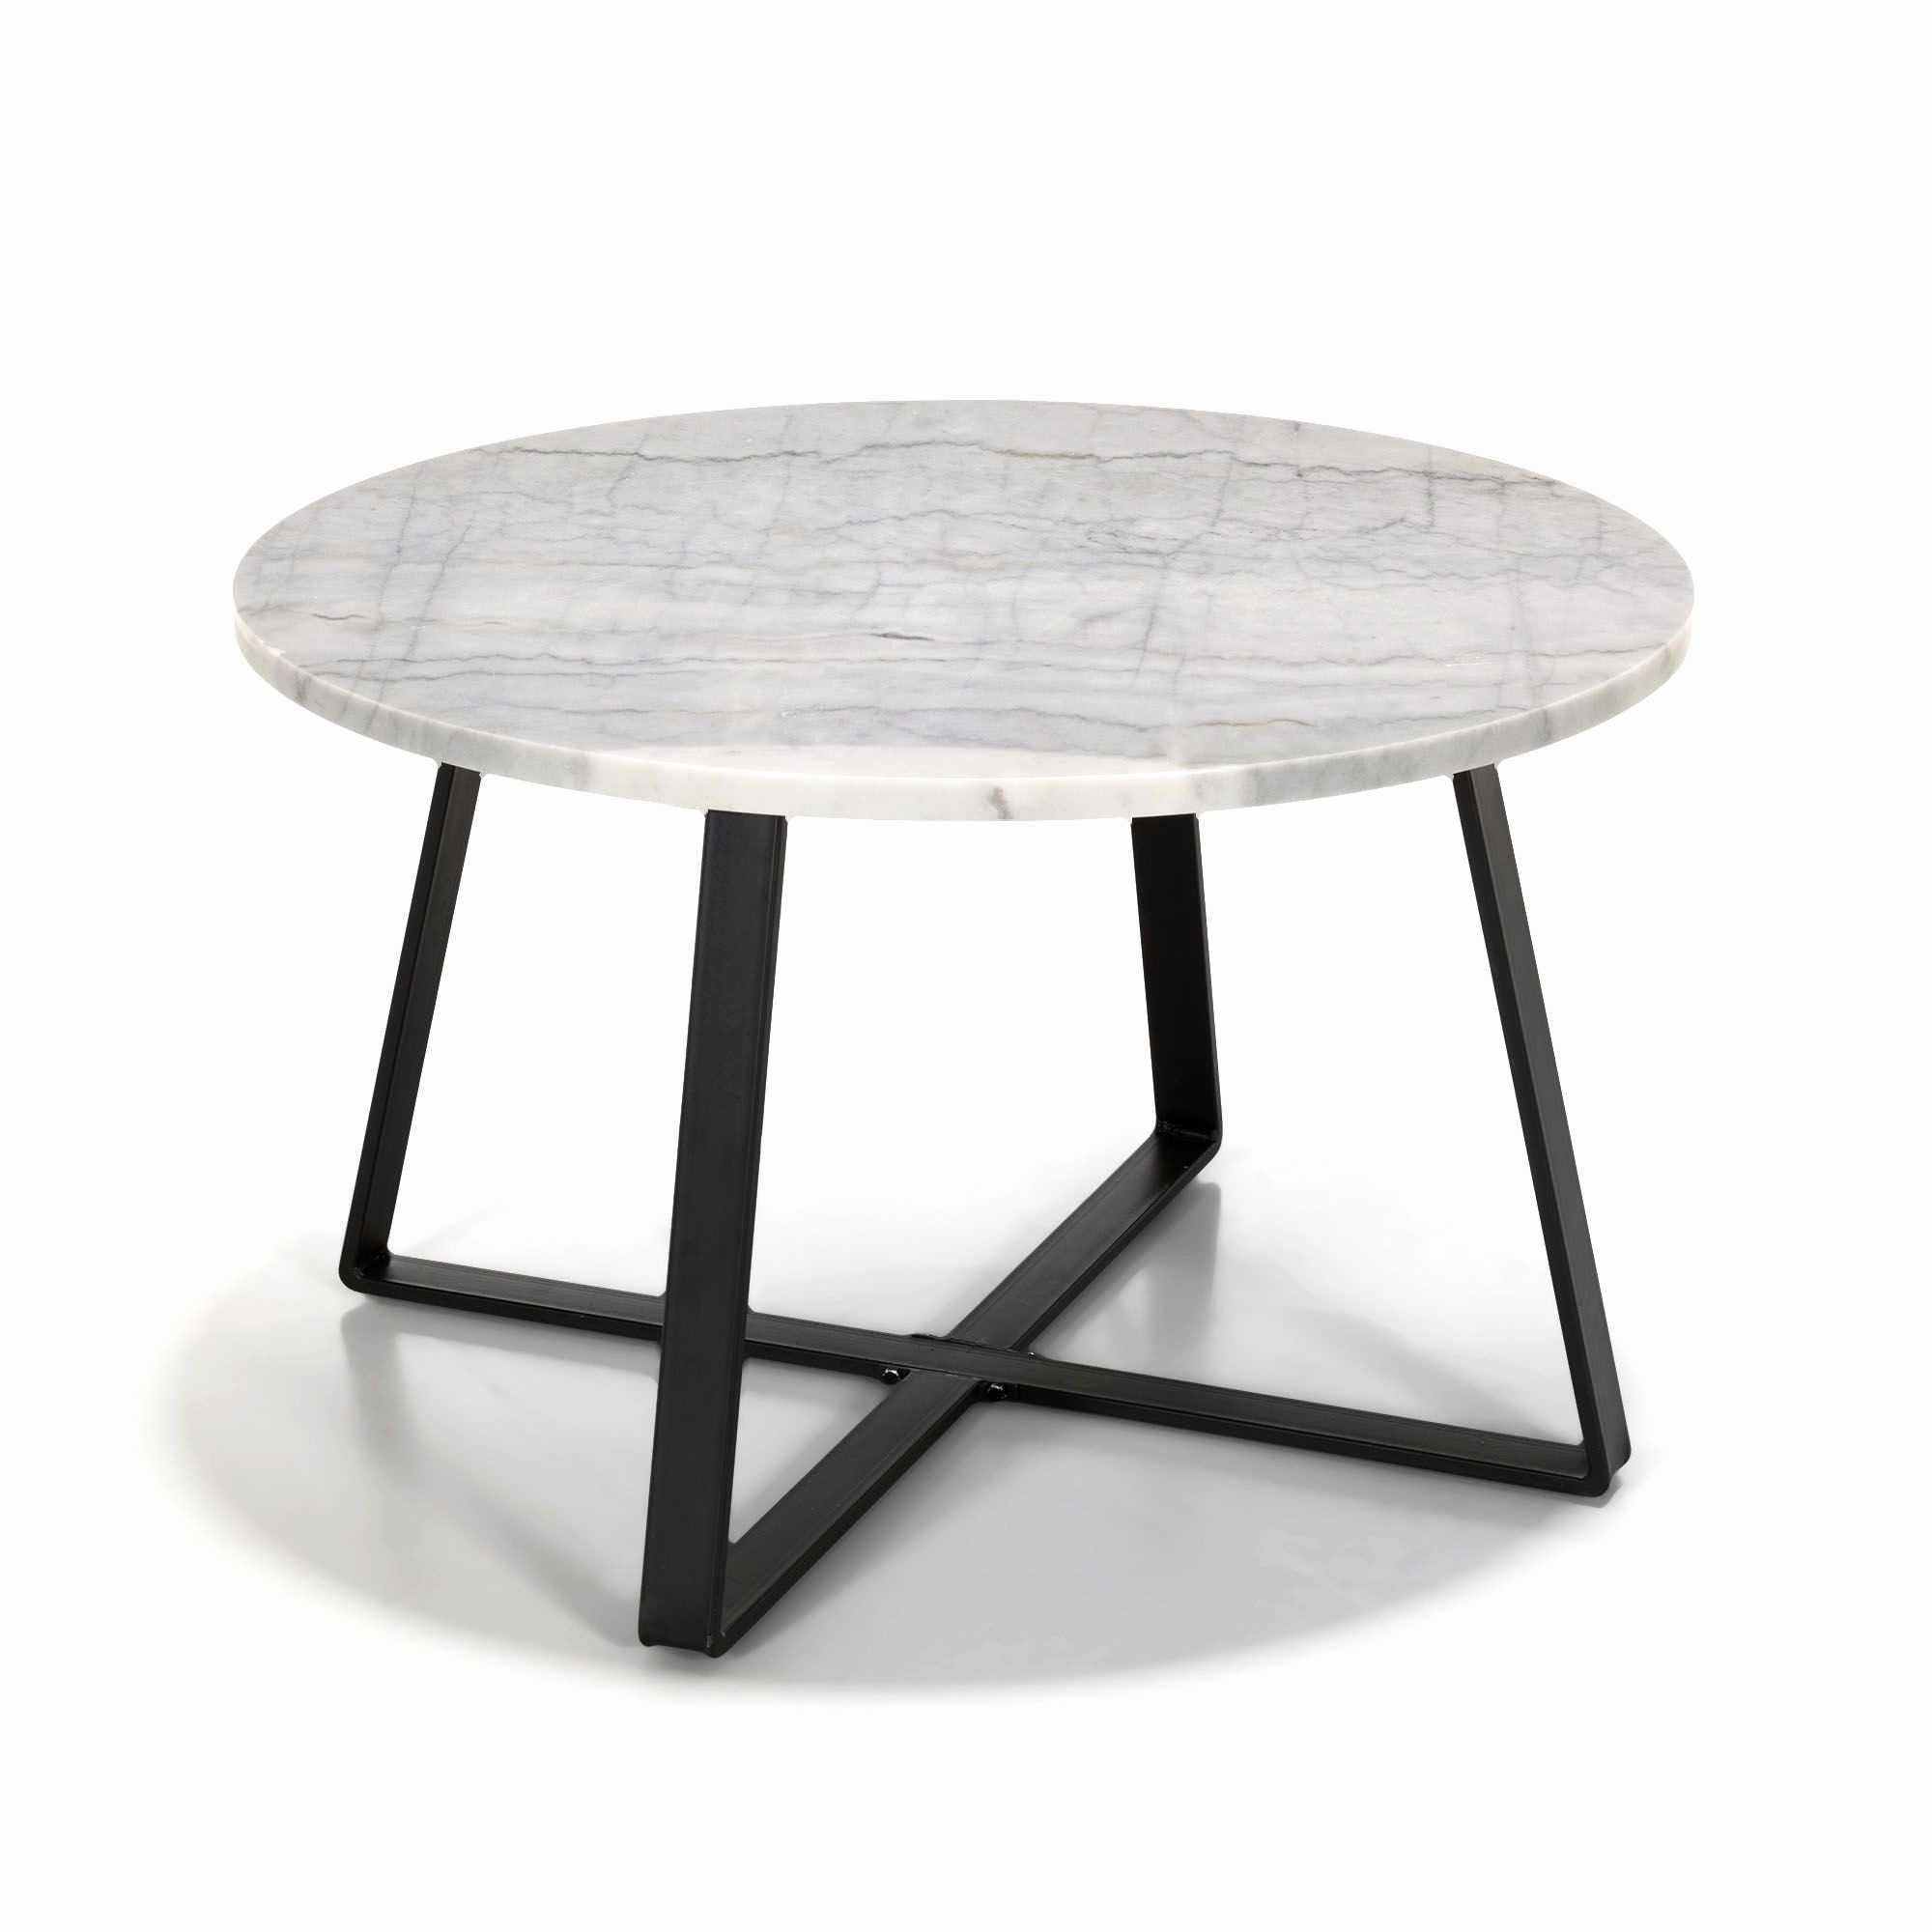 table basse marbre blanc maison du monde. Black Bedroom Furniture Sets. Home Design Ideas